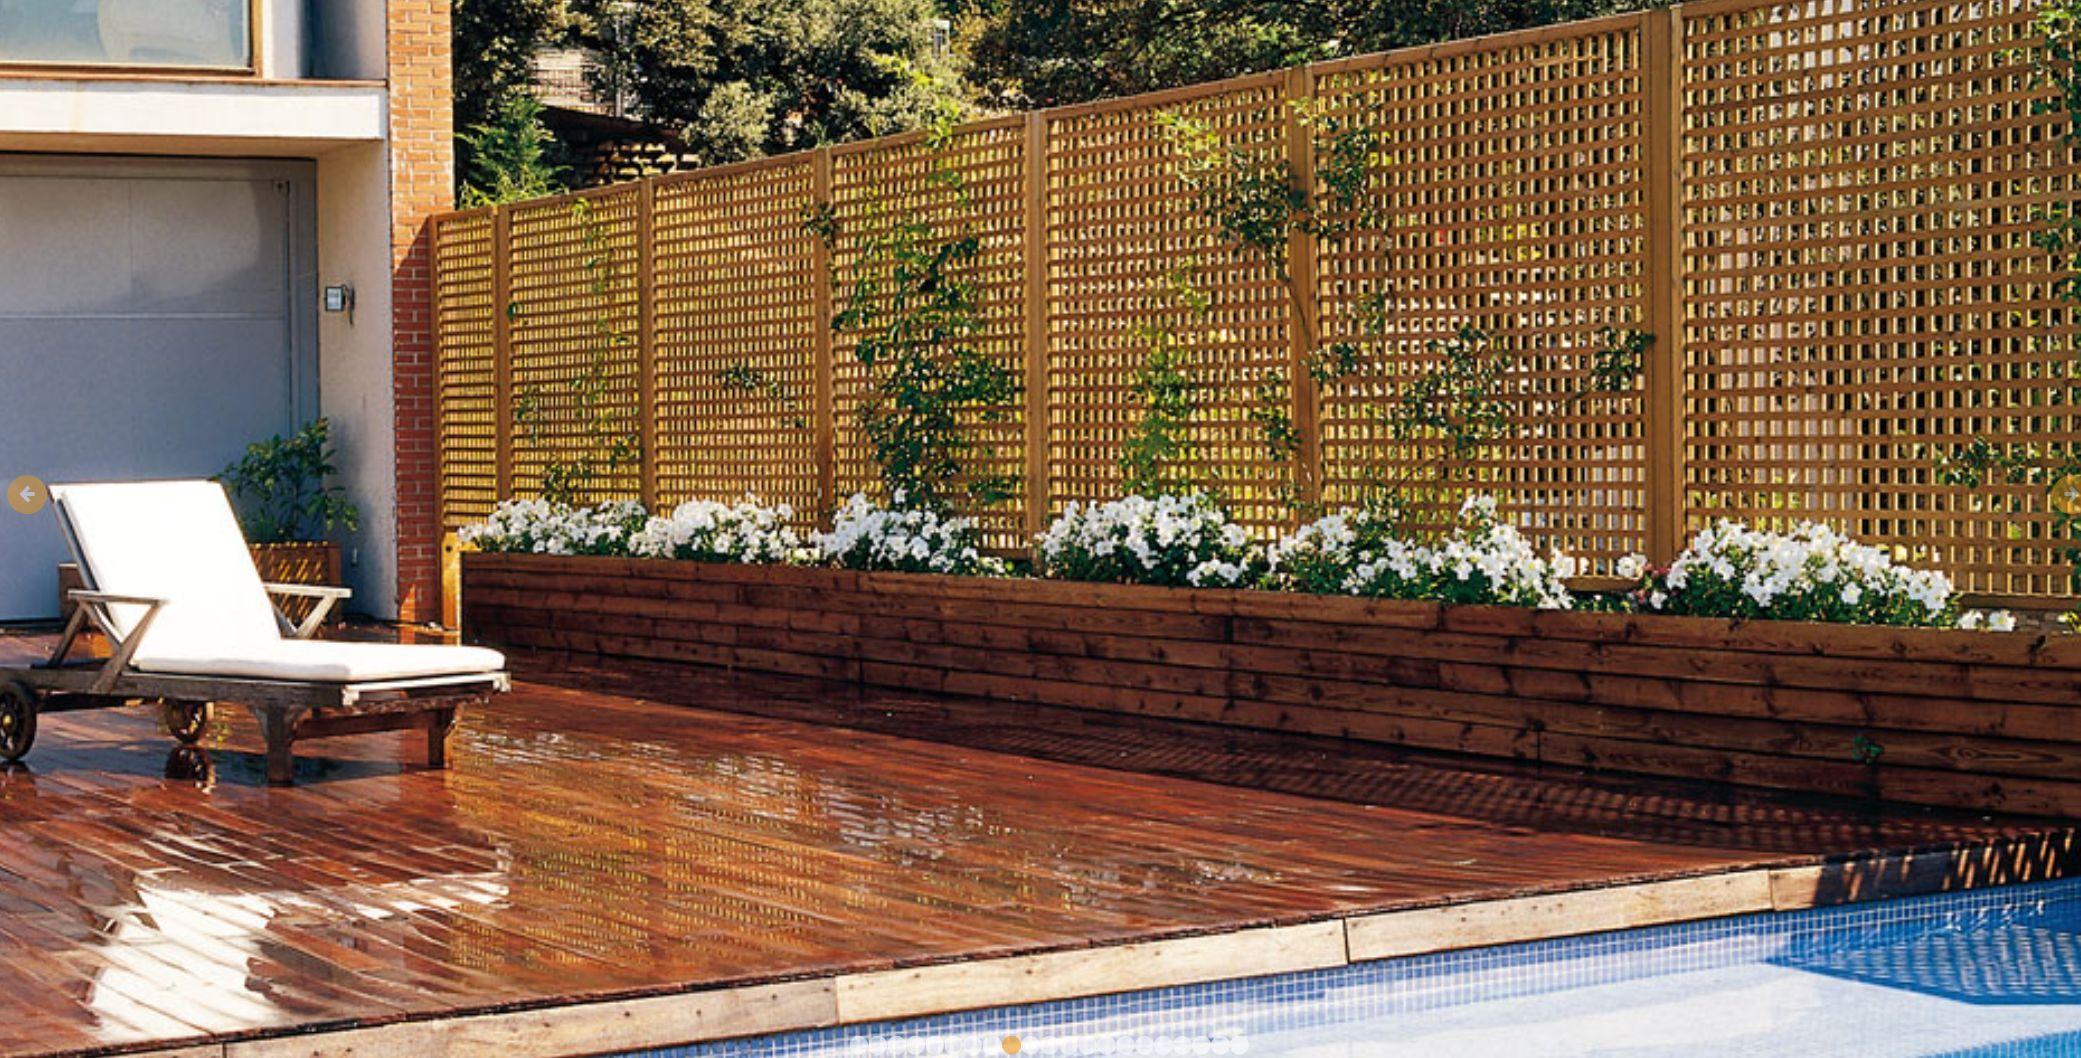 Fireshot screen capture 416 39 celos as y vallas de exterior i greendesign 39 www greendesign - Paneles de madera para jardin ...